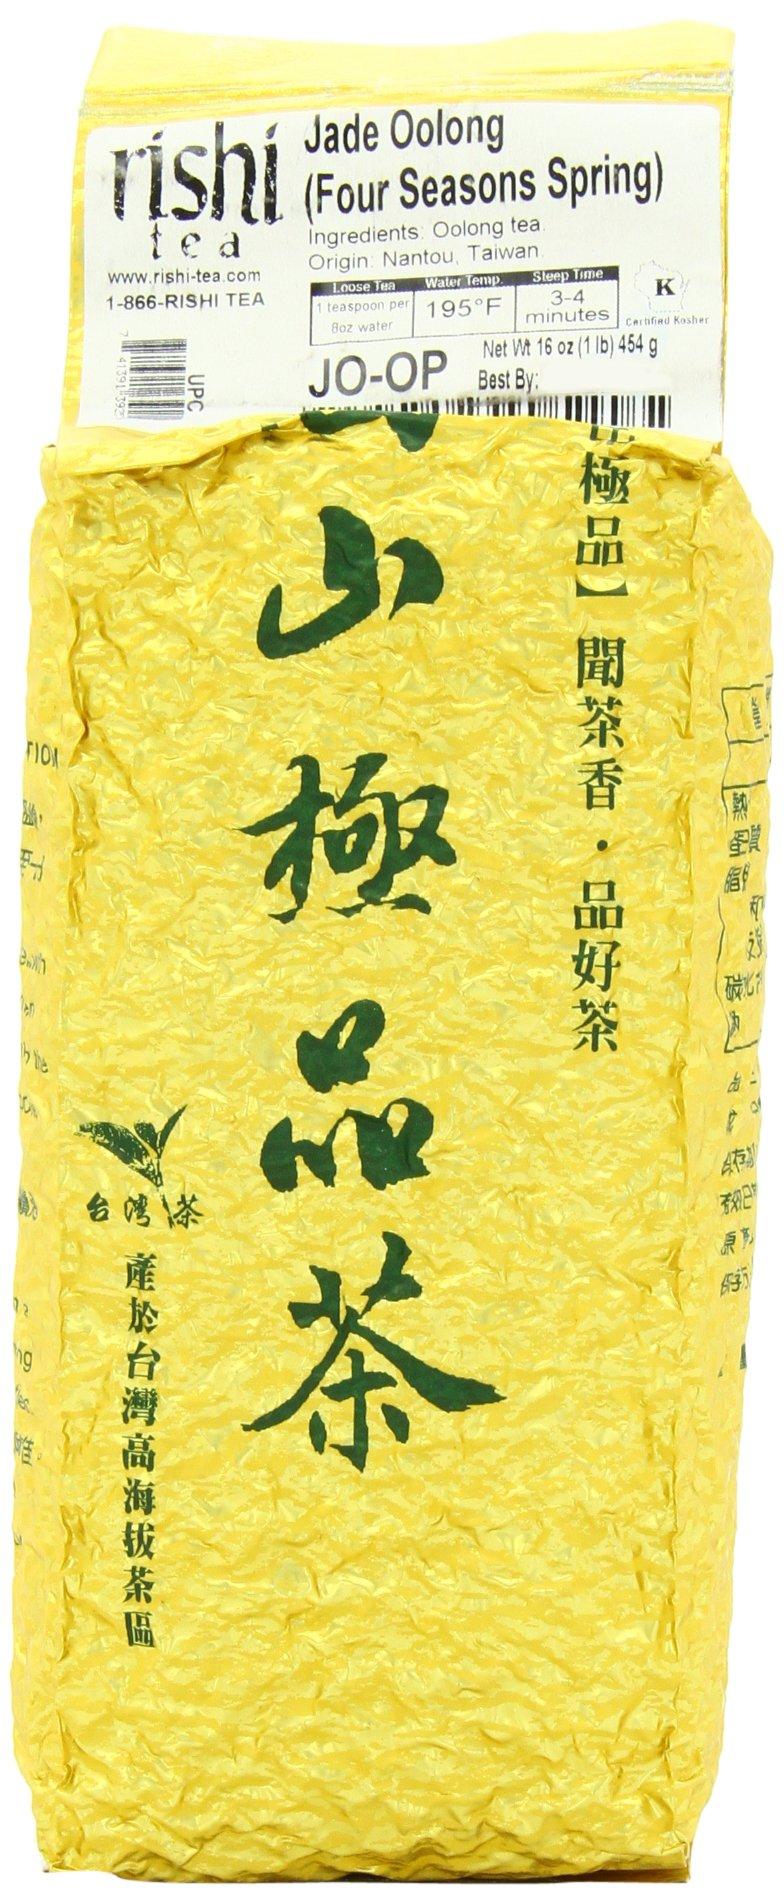 Rishi Tea, Jade Oolong (Four Season Spring), 1-Pound by Rishi Tea